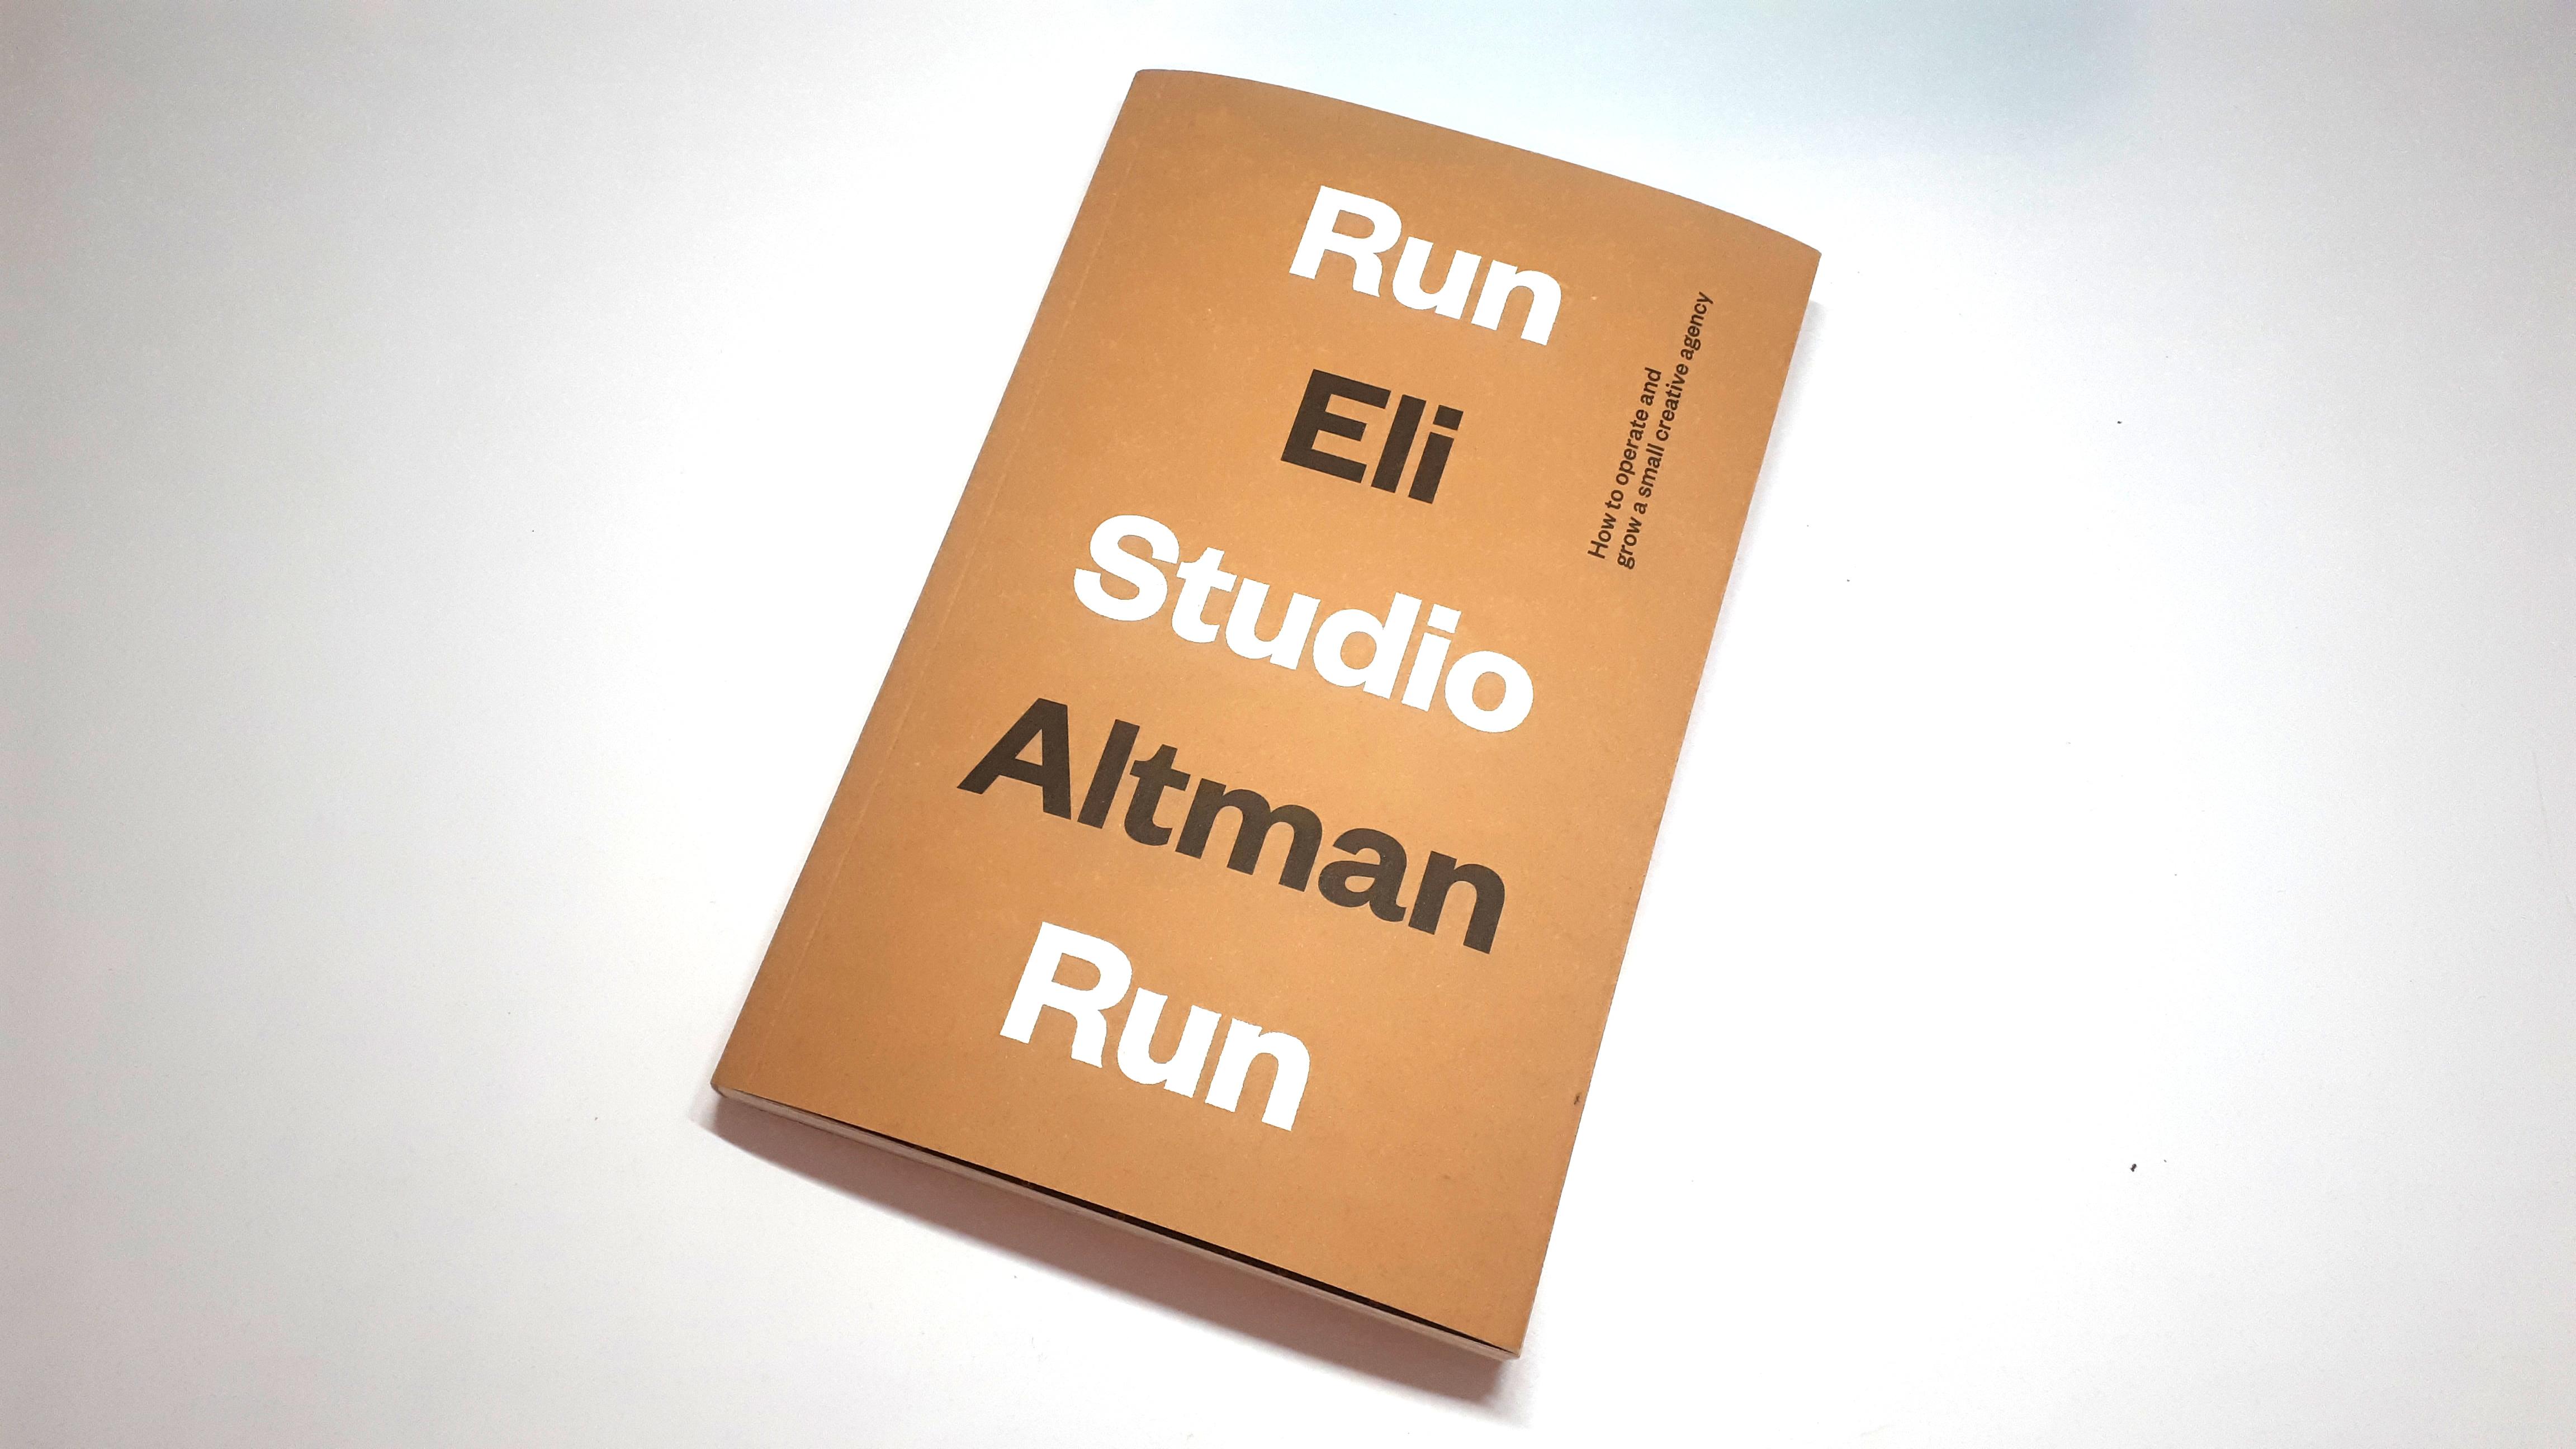 Run Studio Run by Eli Altman